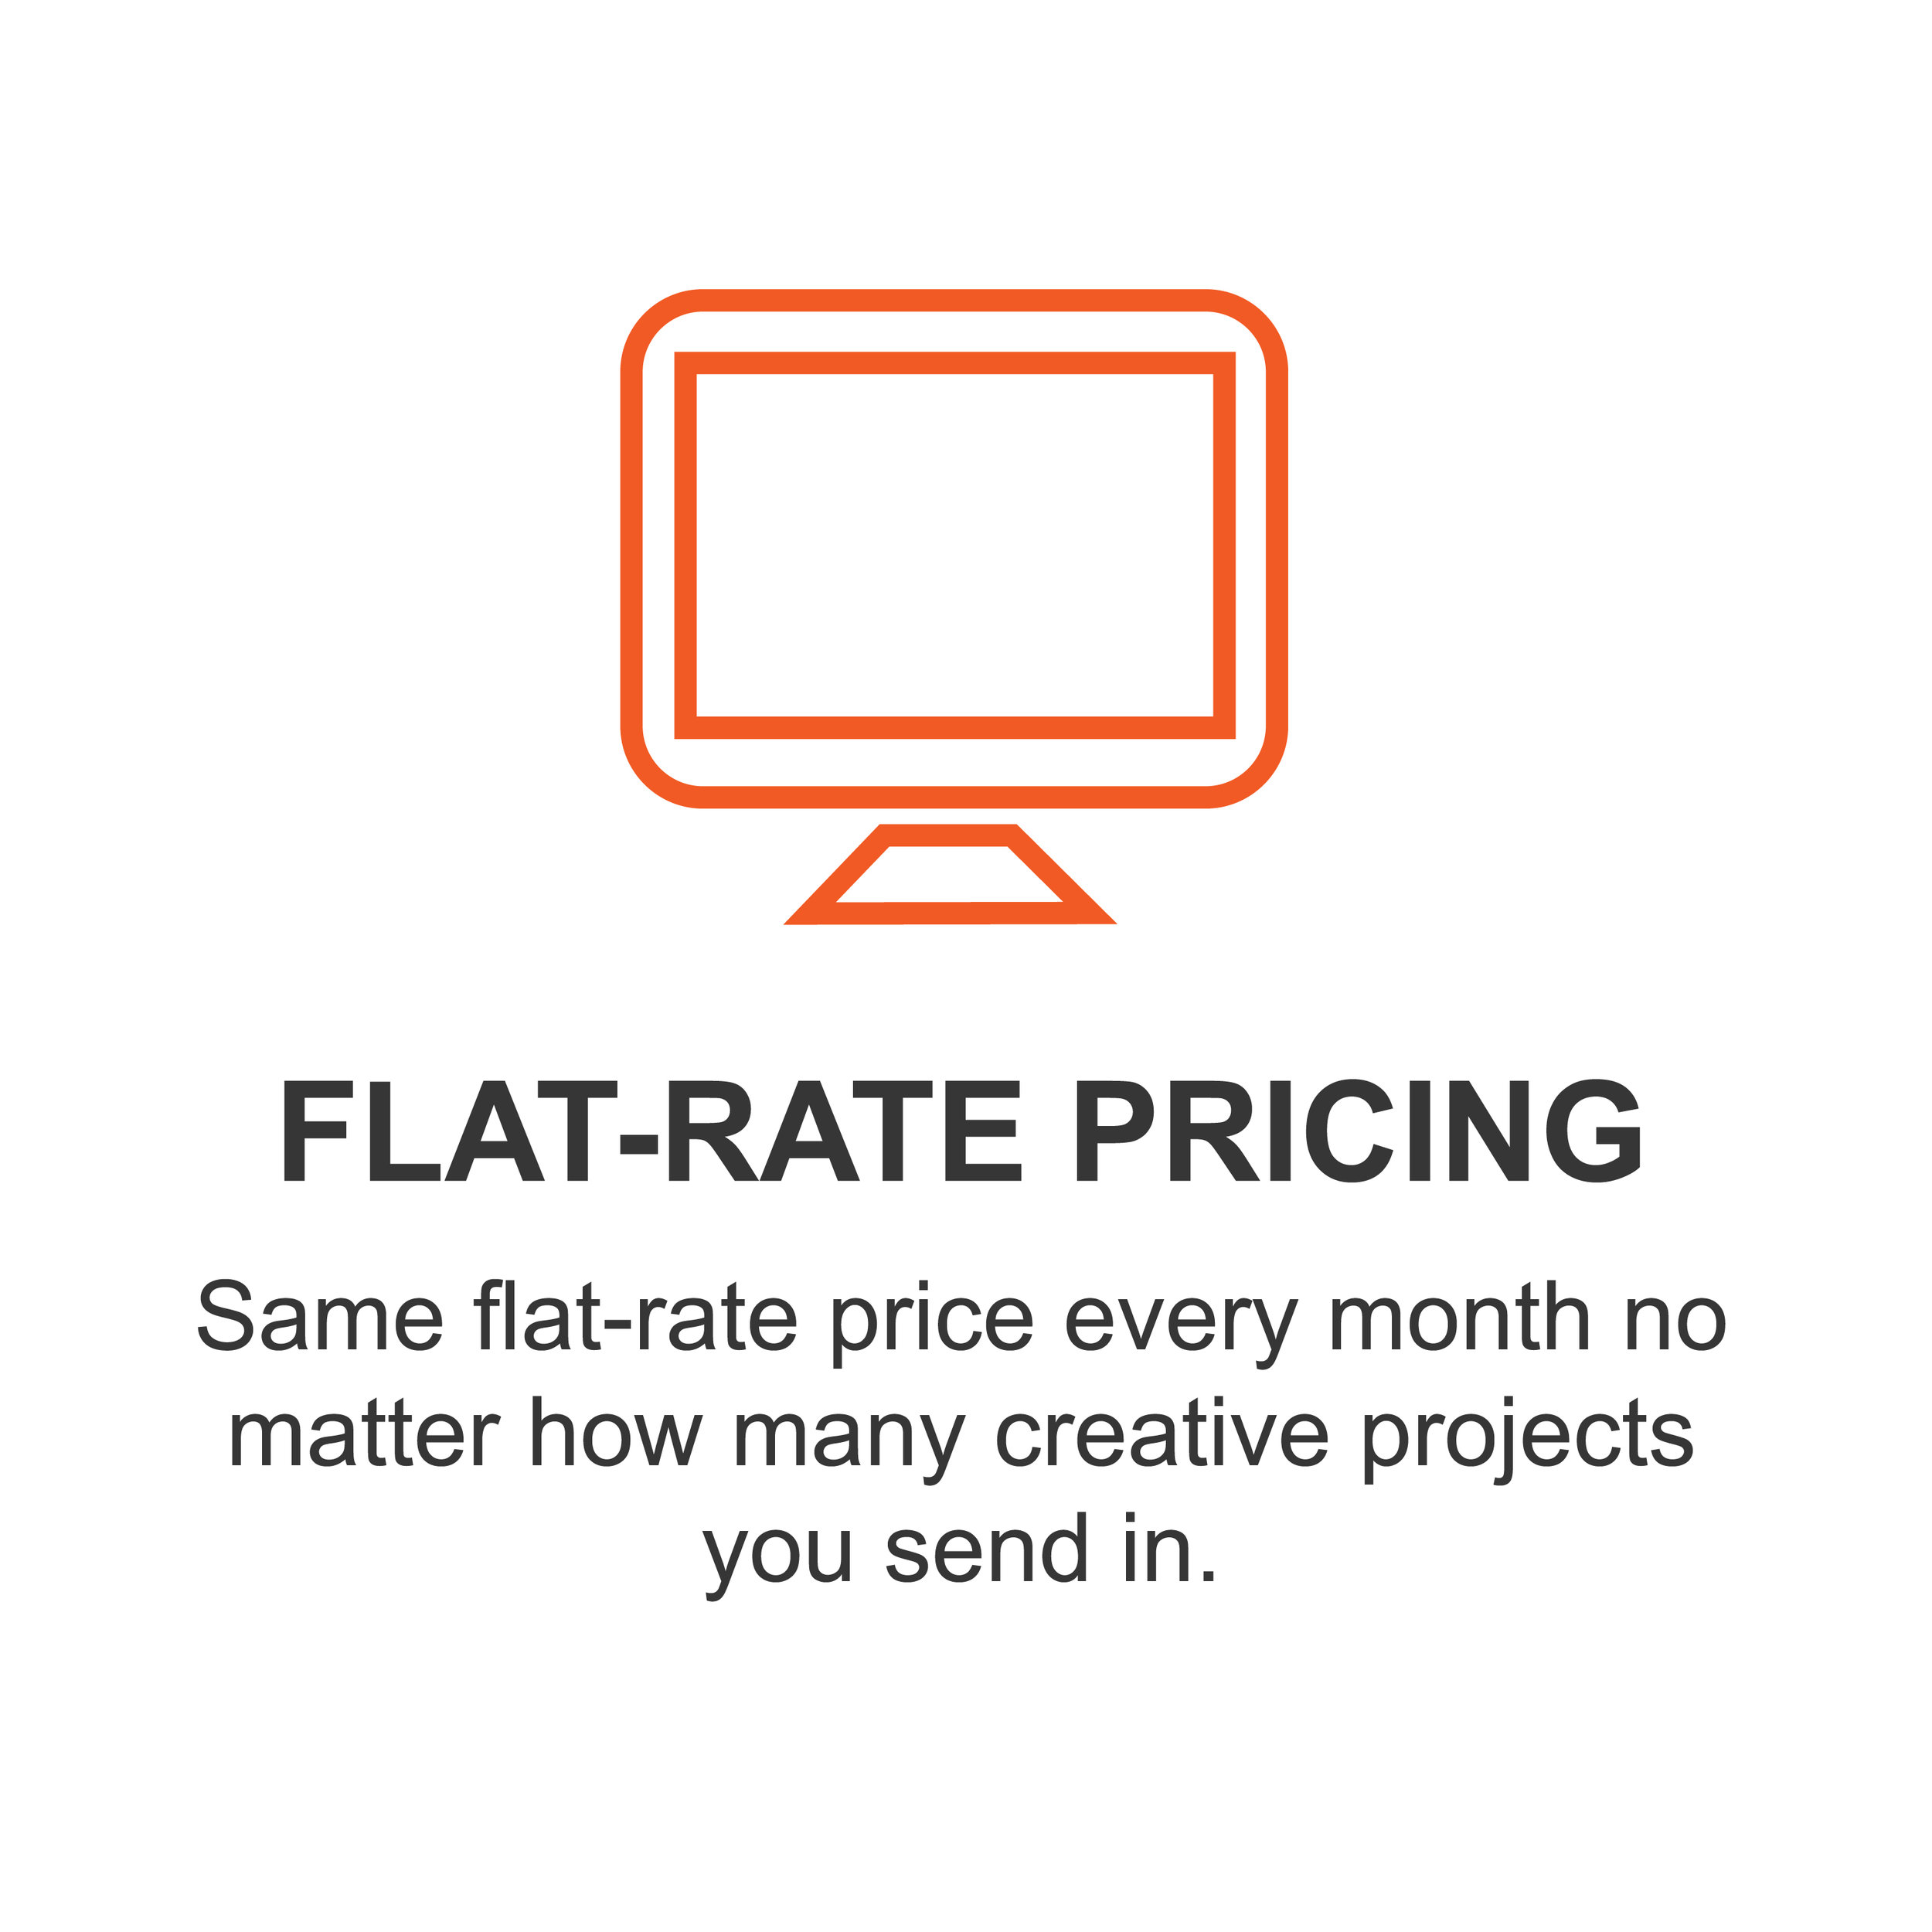 flatratepricingicon1.jpg